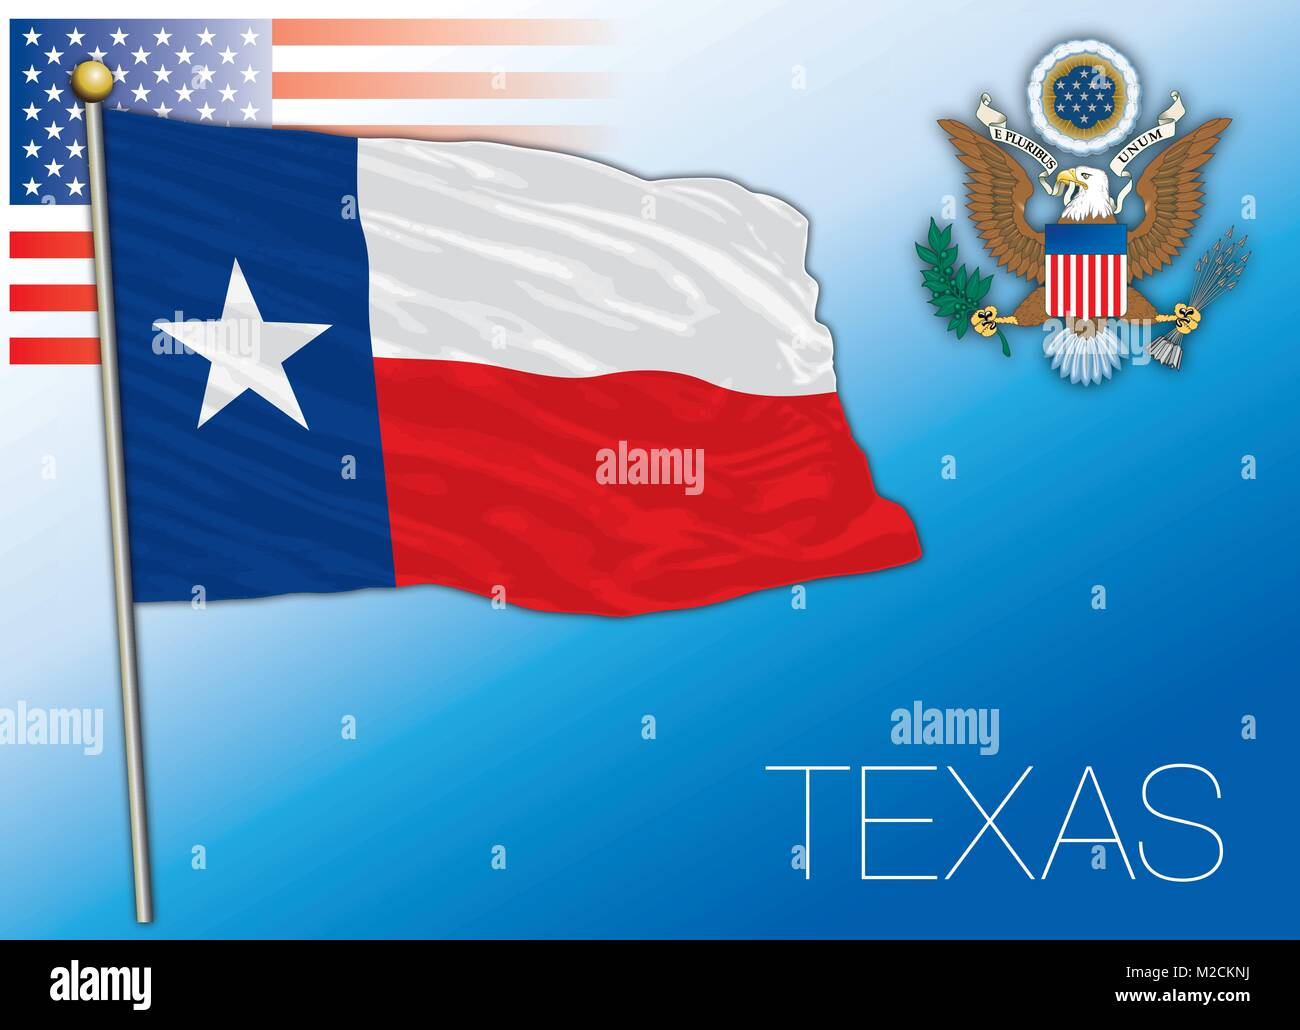 Texas Vector Vectors Imágenes De Stock & Texas Vector Vectors Fotos ...